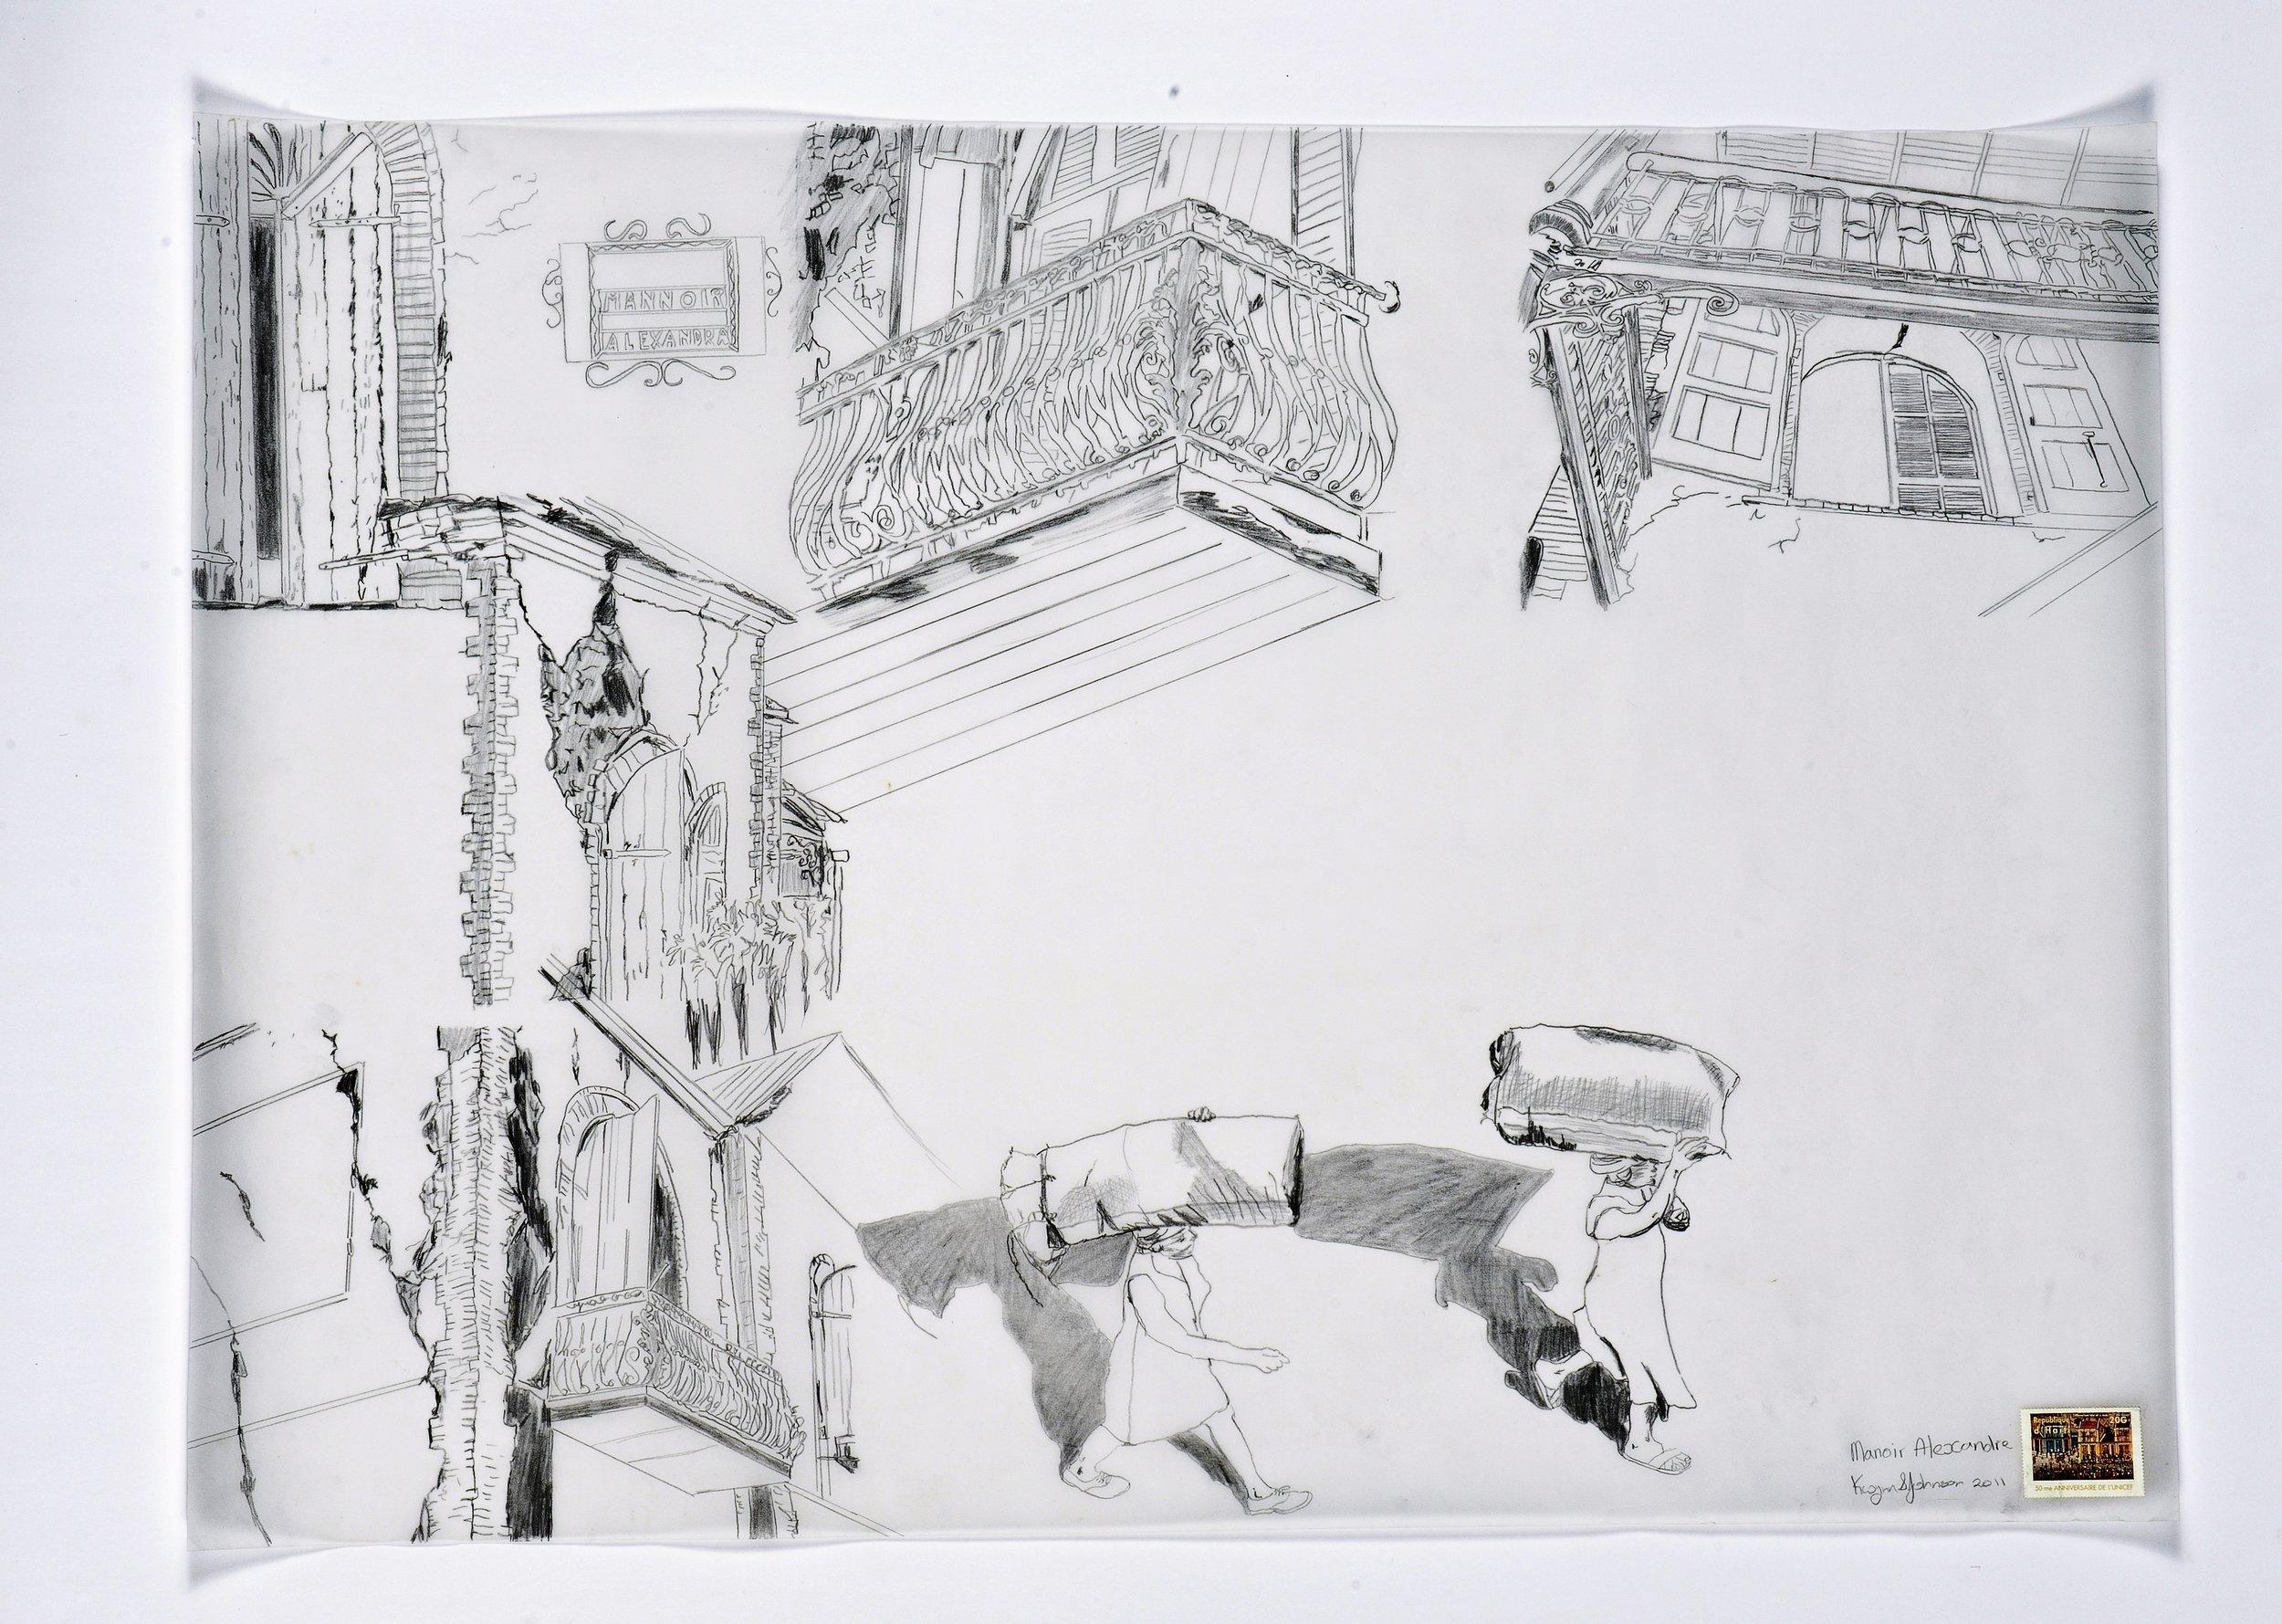 Kwynn Johnson.  Hadriana dans tous mes rêves , 2011. Graphite on Vellum, 2x3 ft. Exhibition:  How the Light Enters  (2013, Trinidad & Haiti).